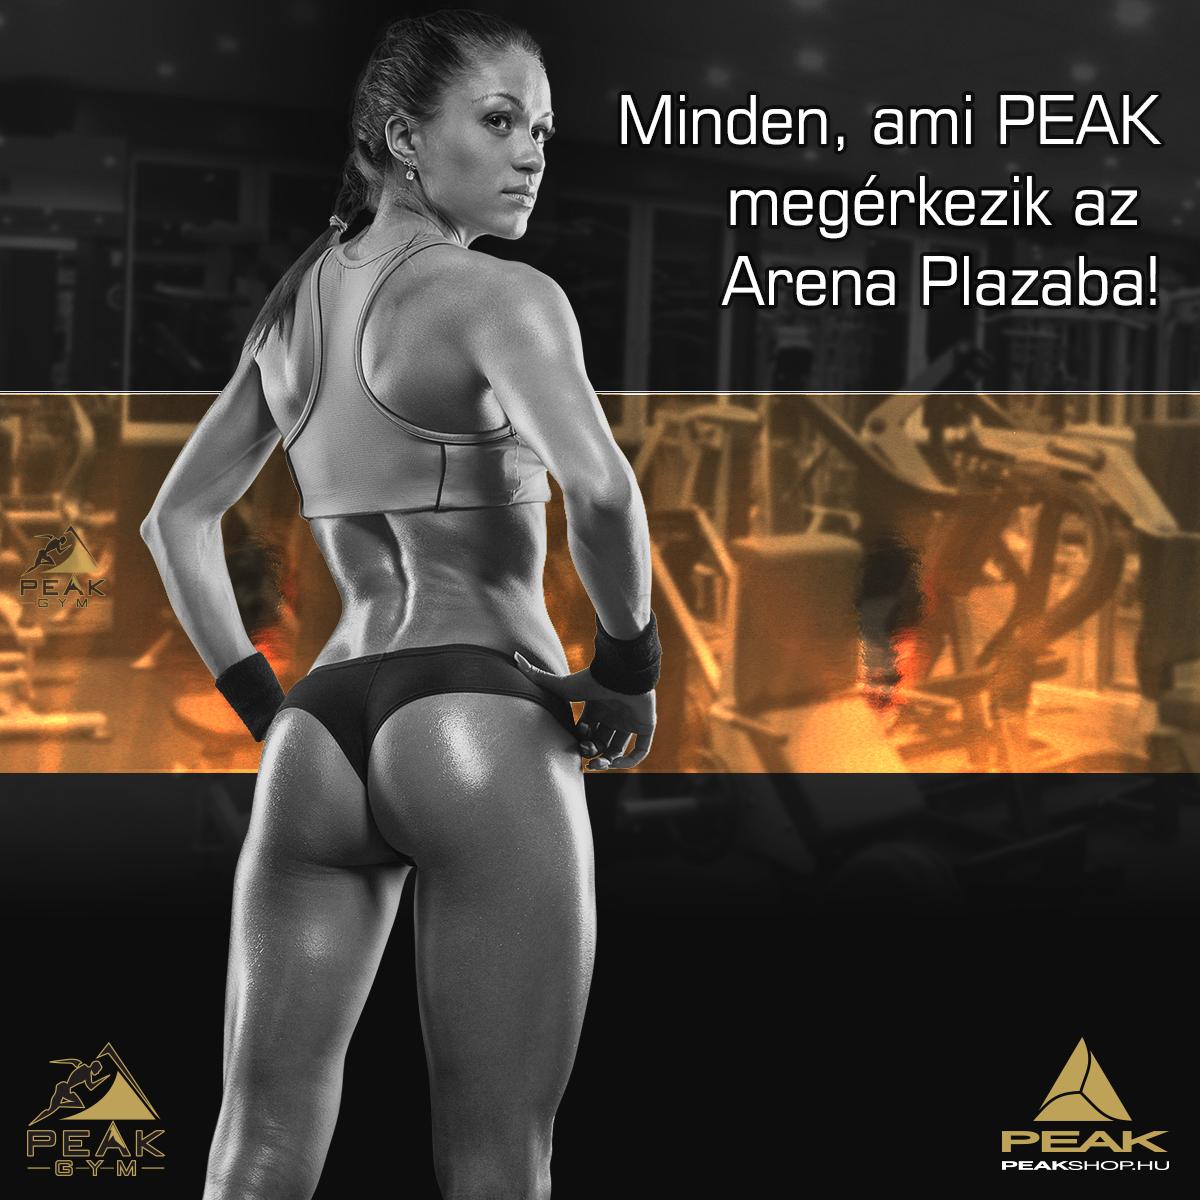 peak-gym-arena